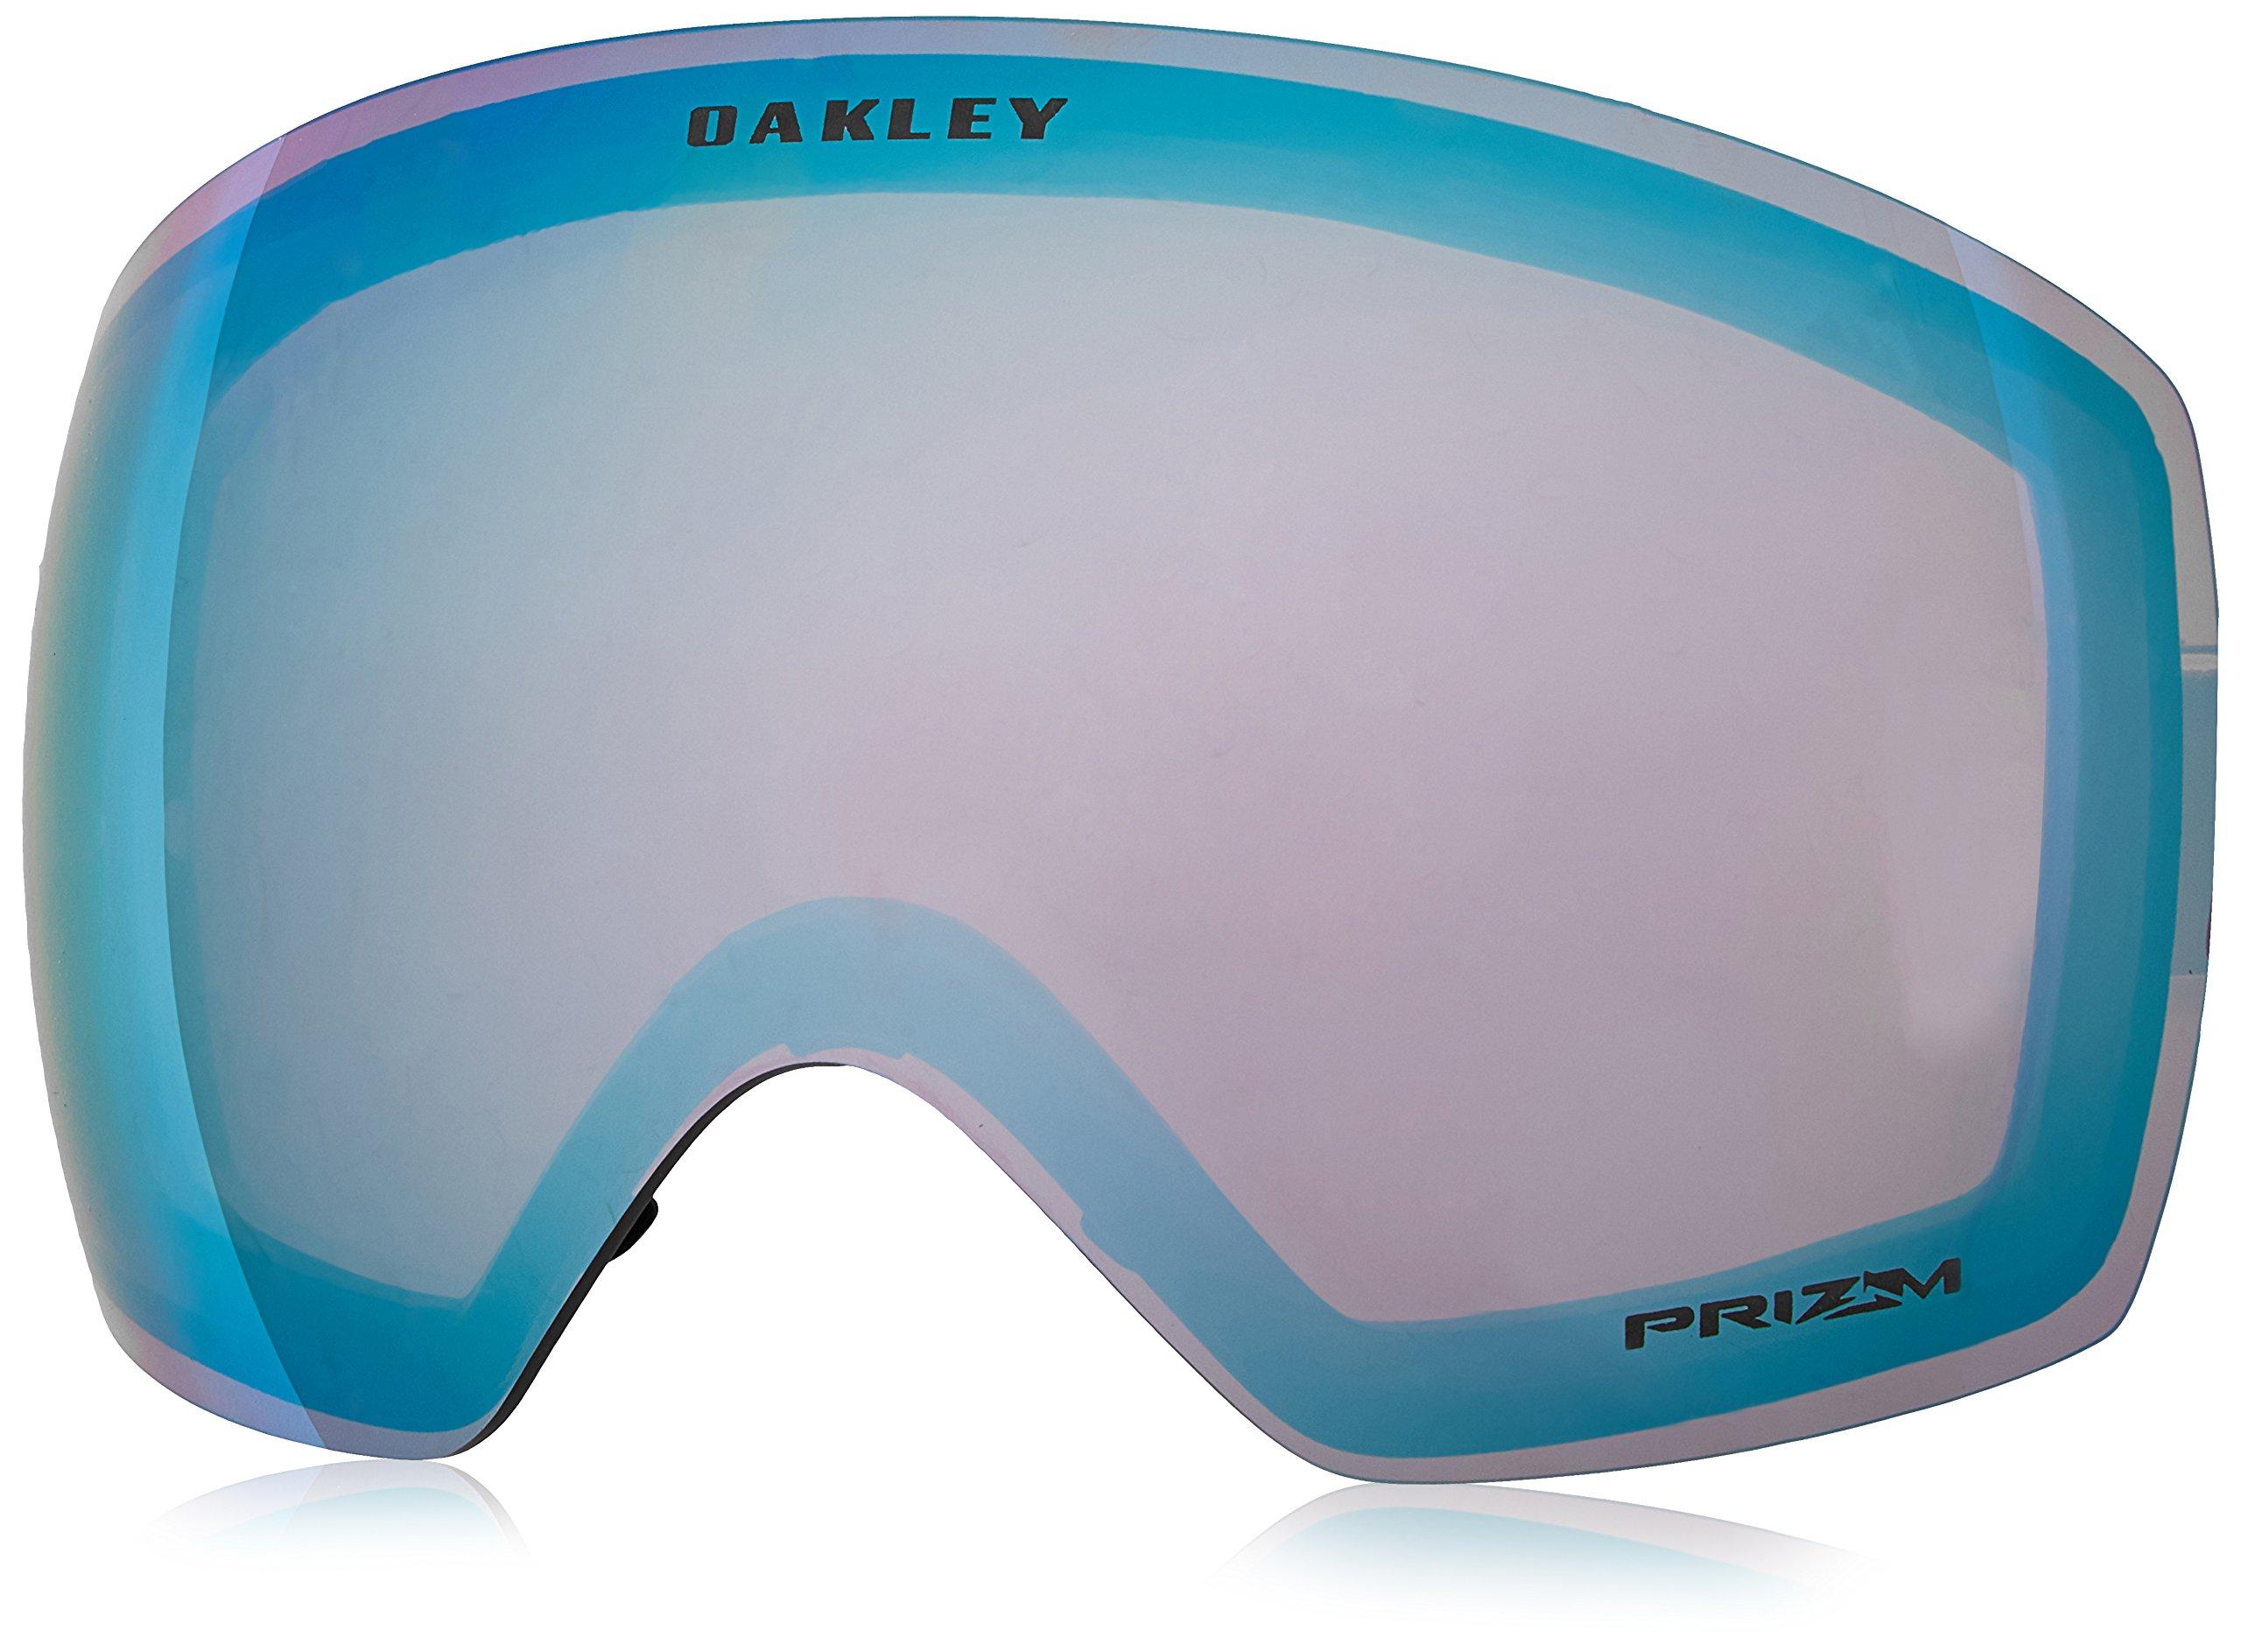 Oakley 101 423 001 Flight Deck Replacement Lens, Prizm Sapphire Iridium